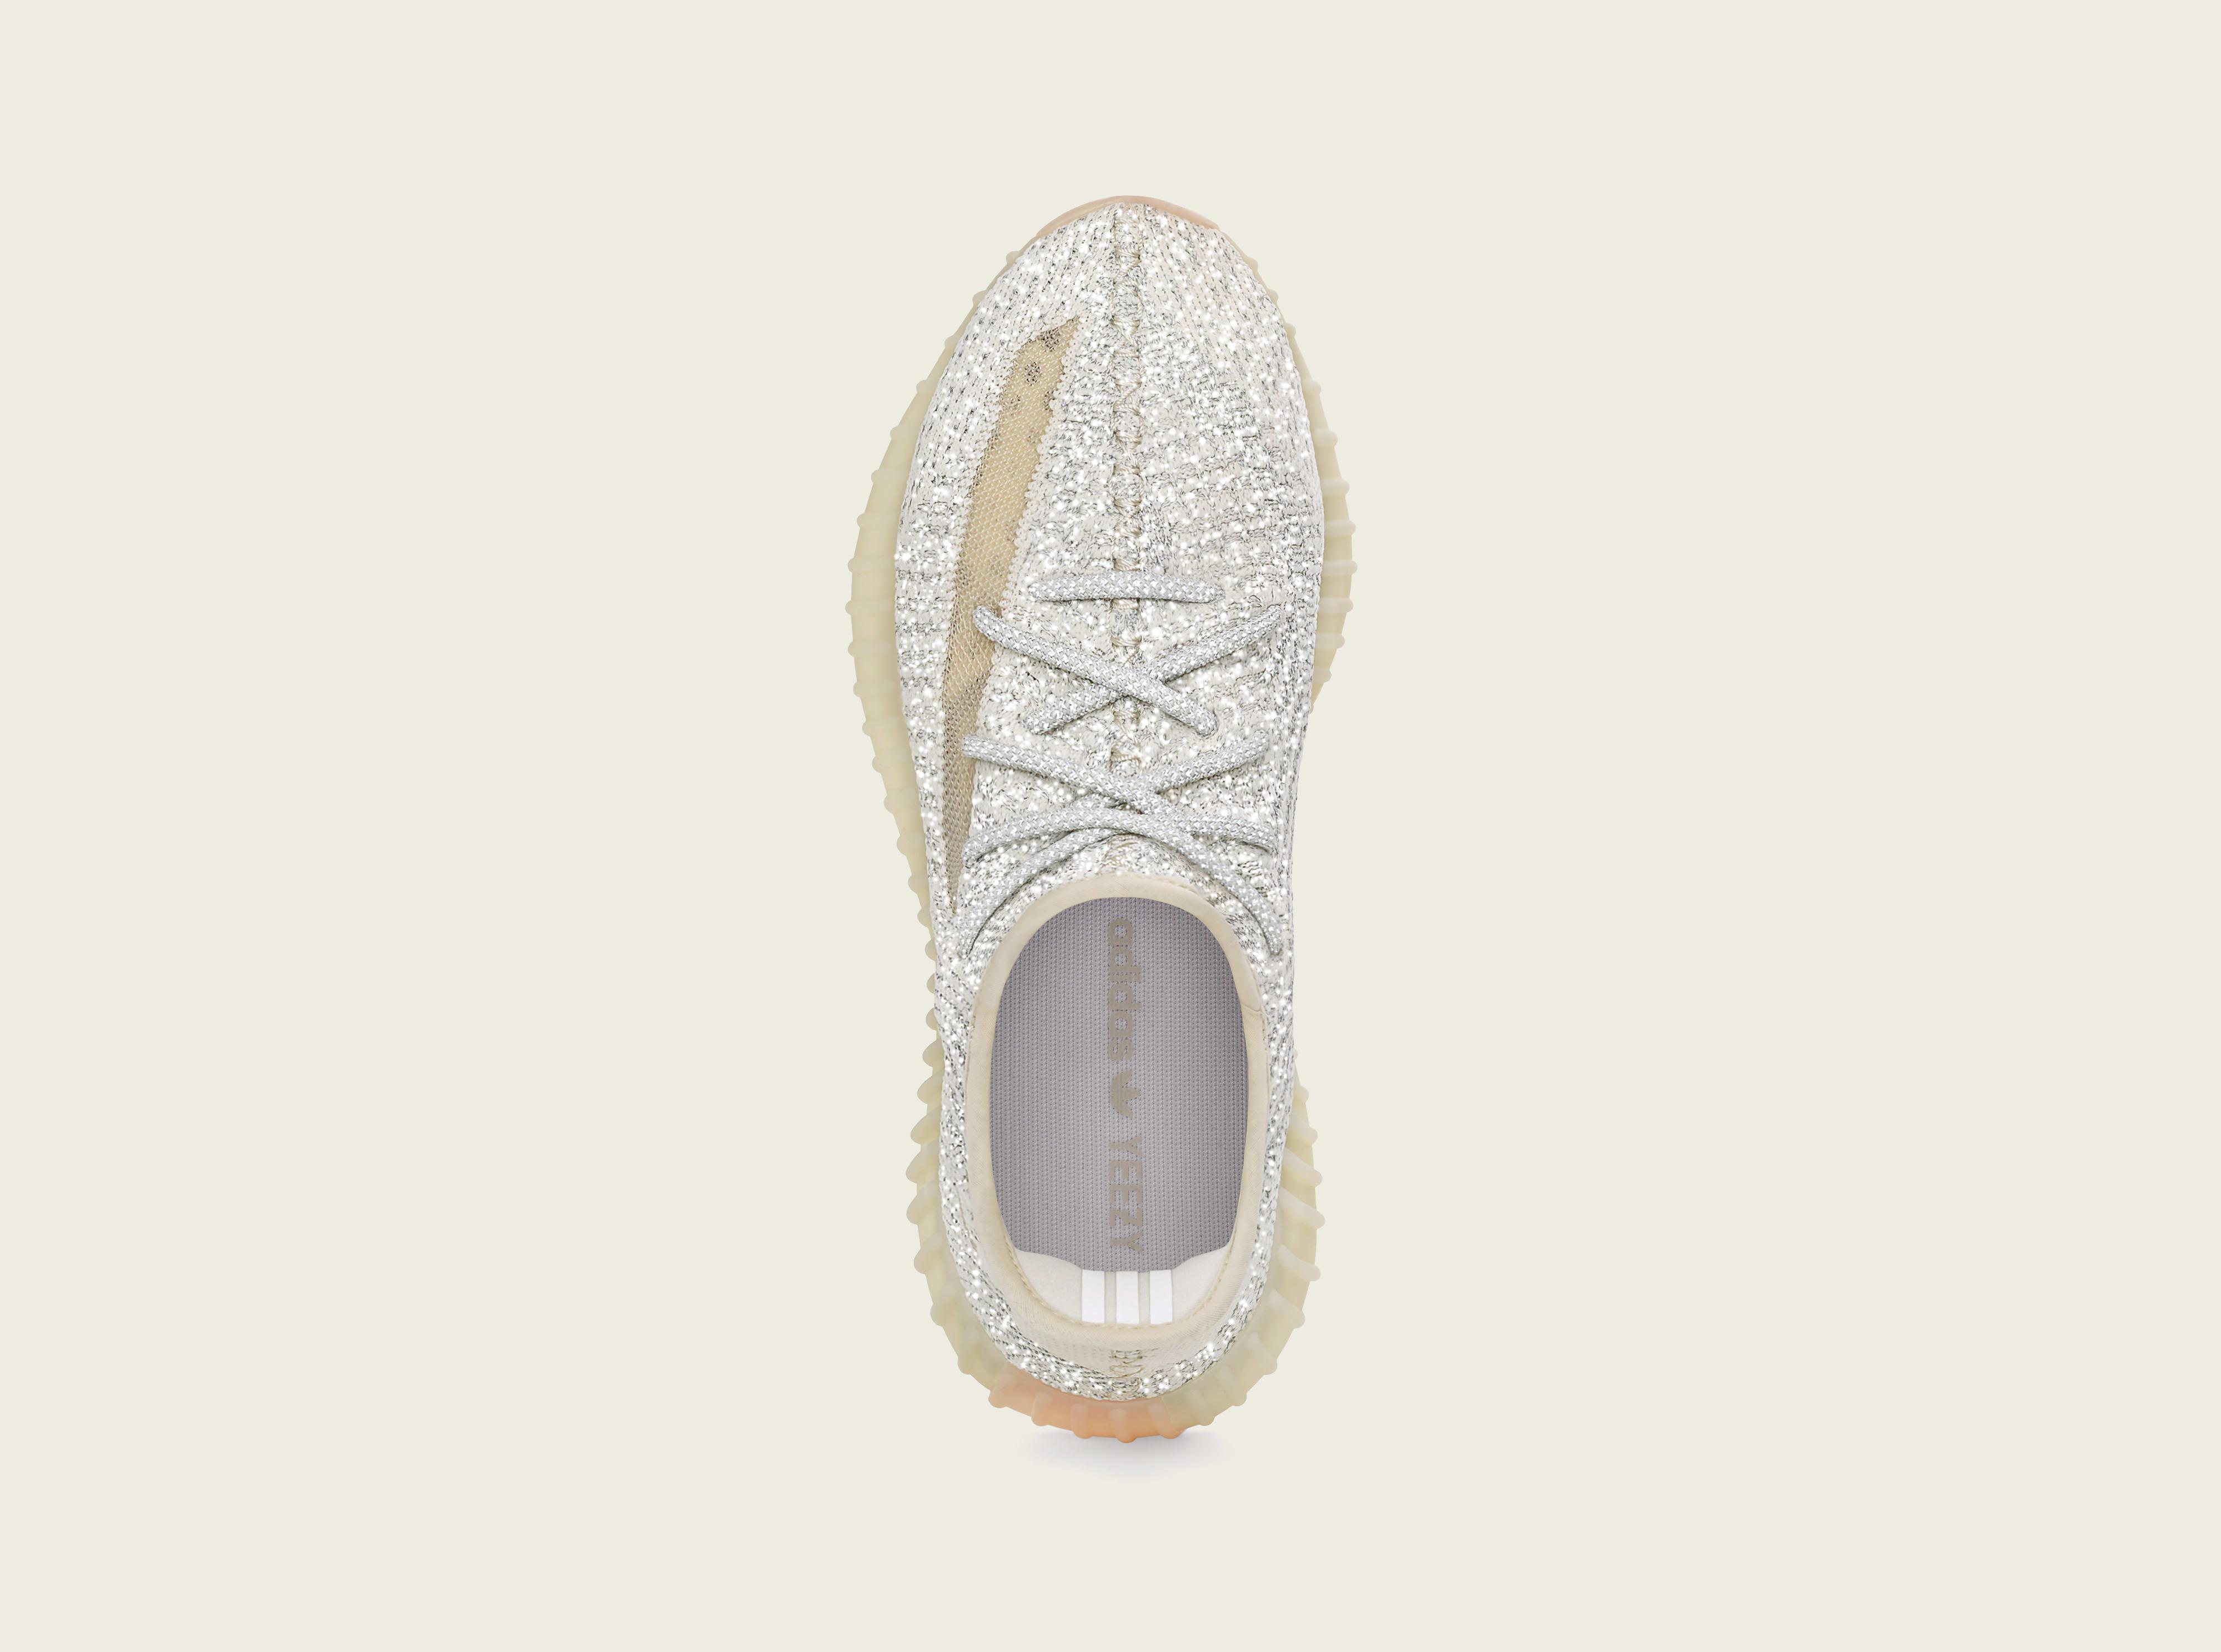 Adidas Yeezy Boost 350 V2 'Lundmark/Reflective' (Top)